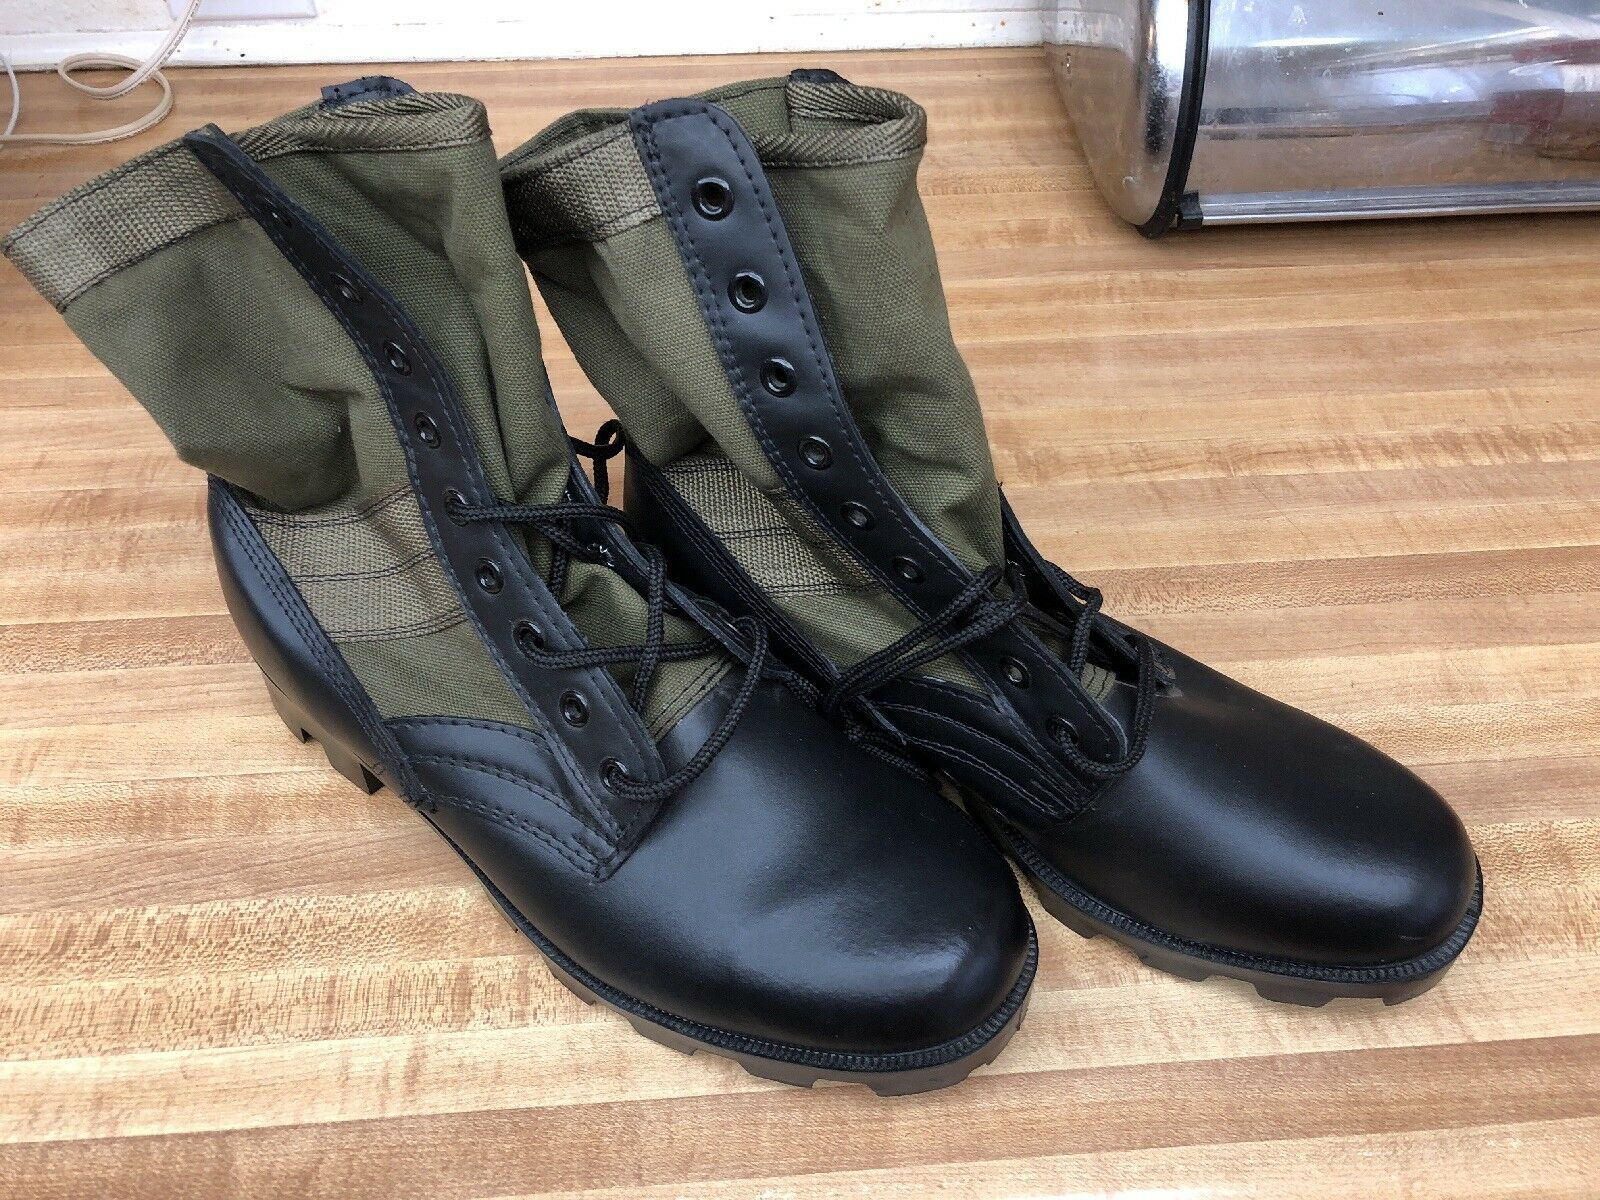 Rothco Jungle Stivali Olive Drab Pelle Military Rothco 5080 Panama Sole Size 12R